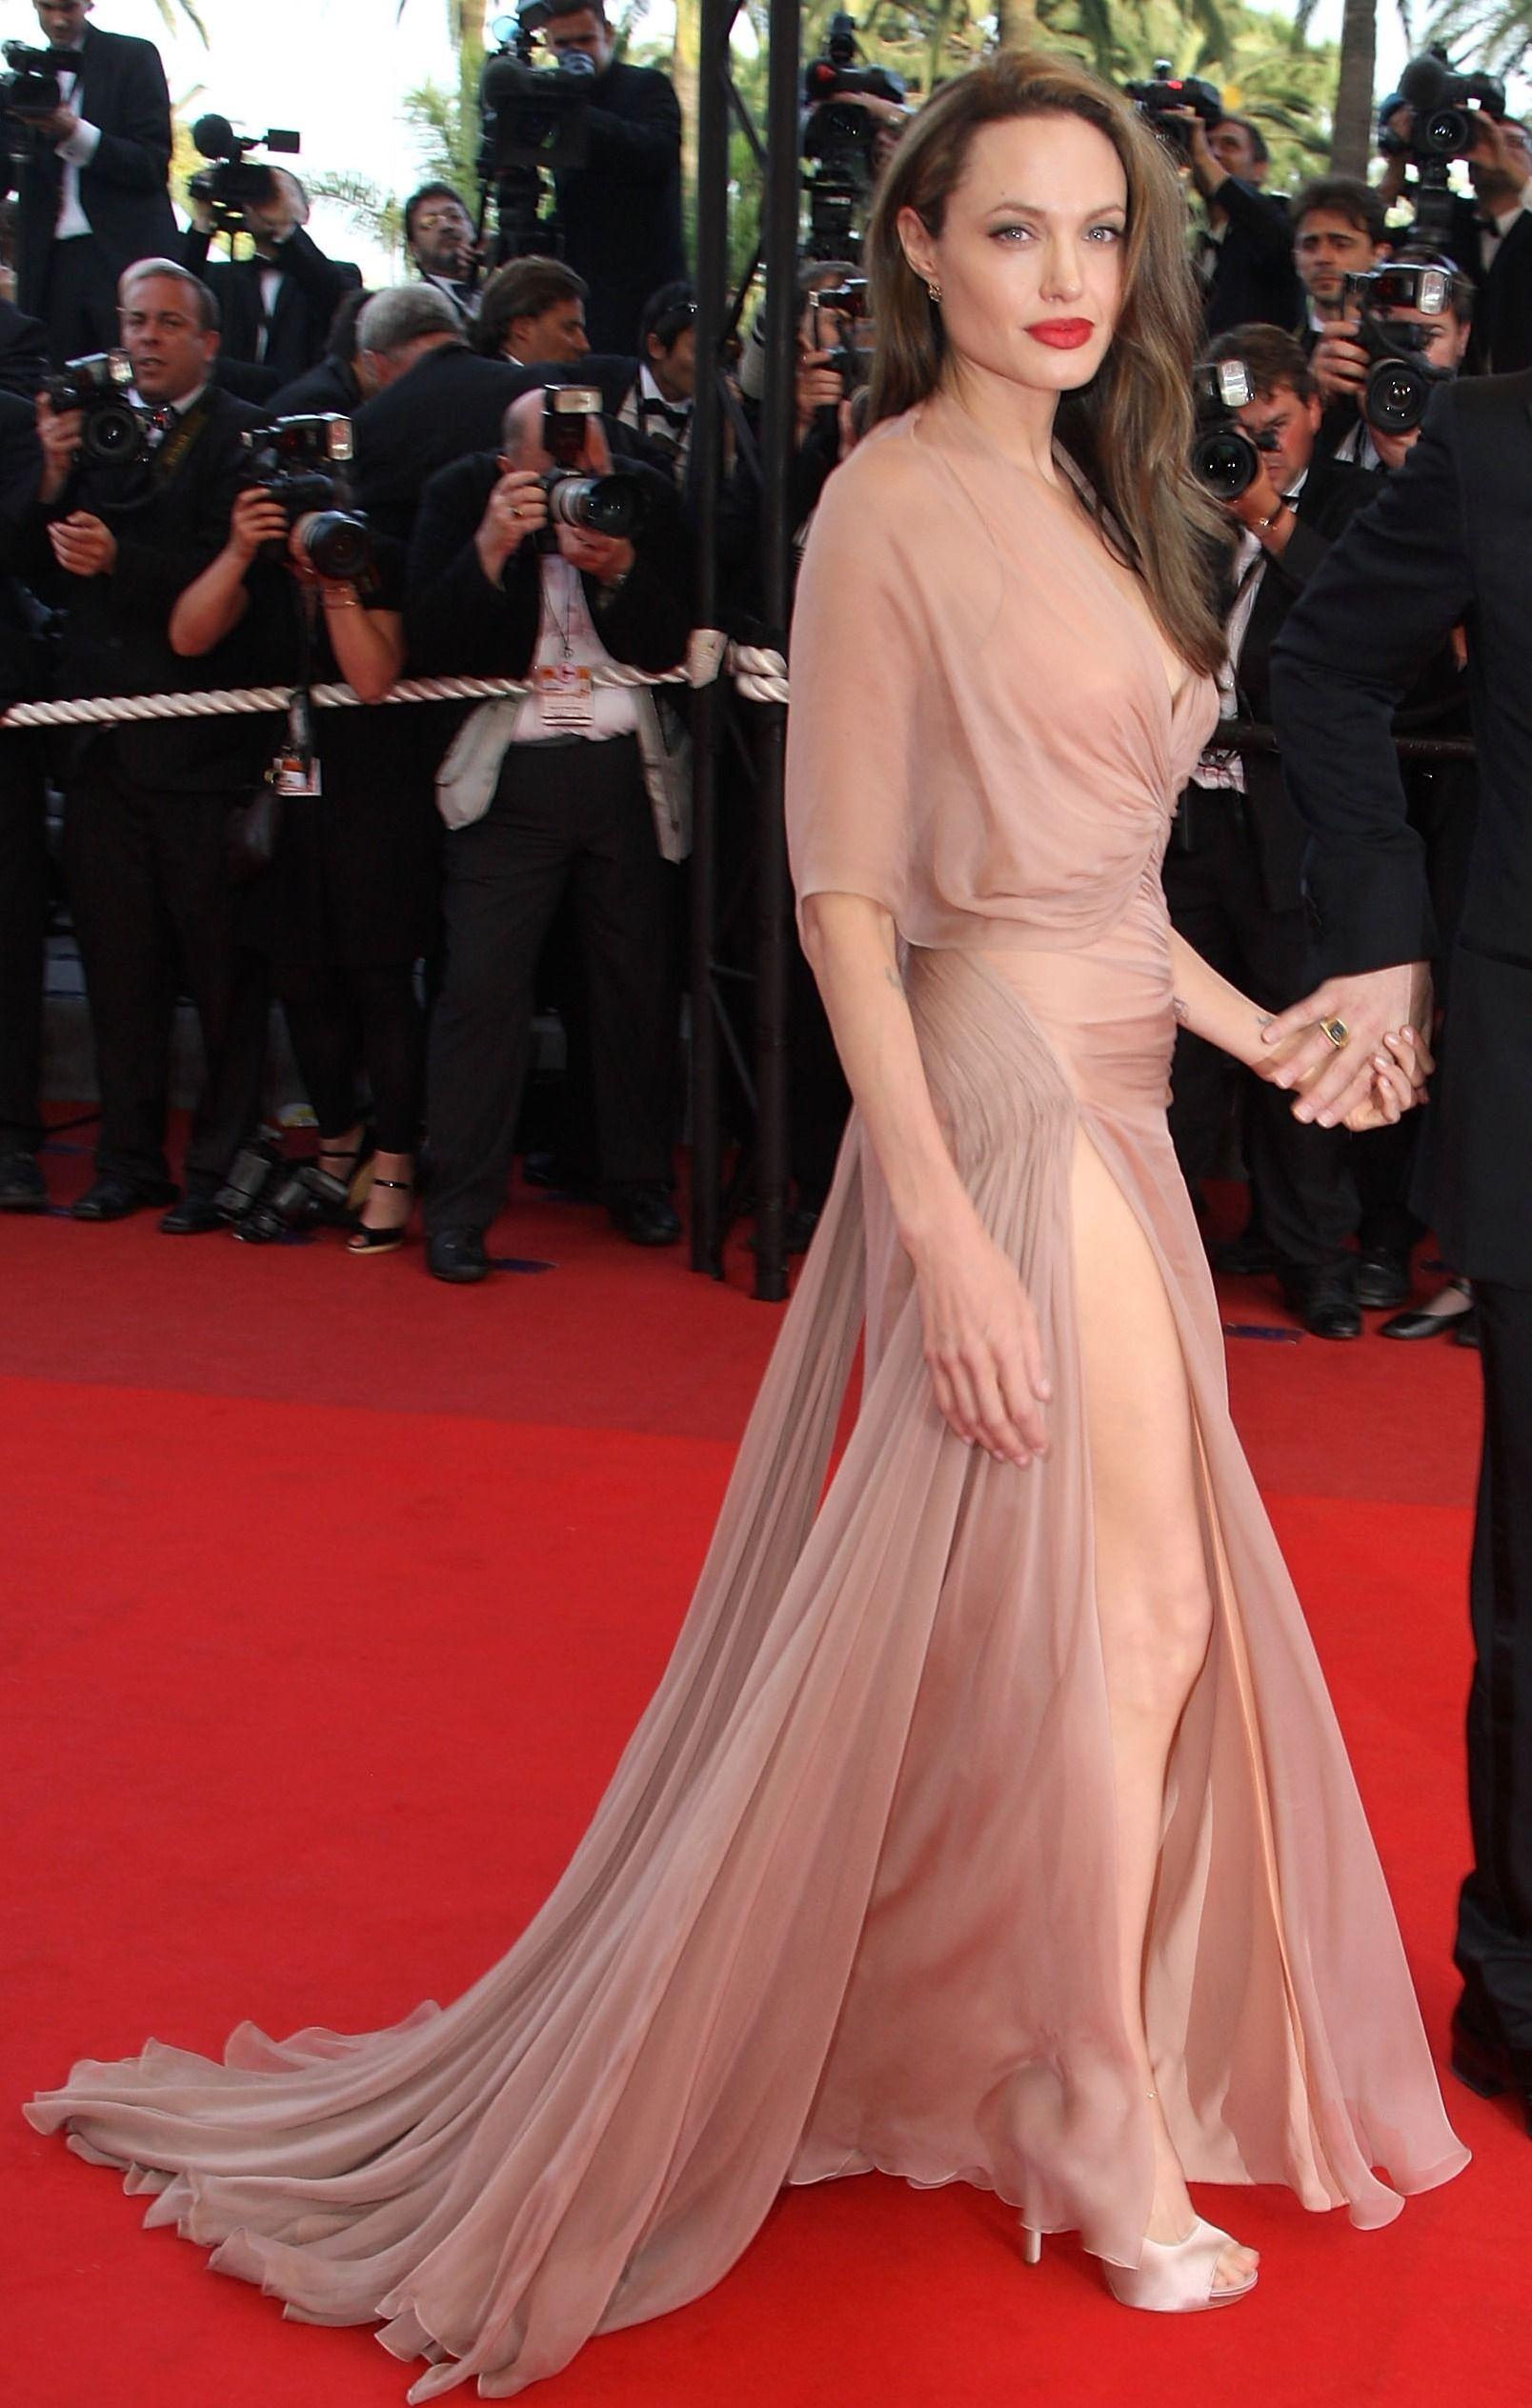 c30177c8c6c3 Nude Versace-Angelina Jolie  love love love this dress